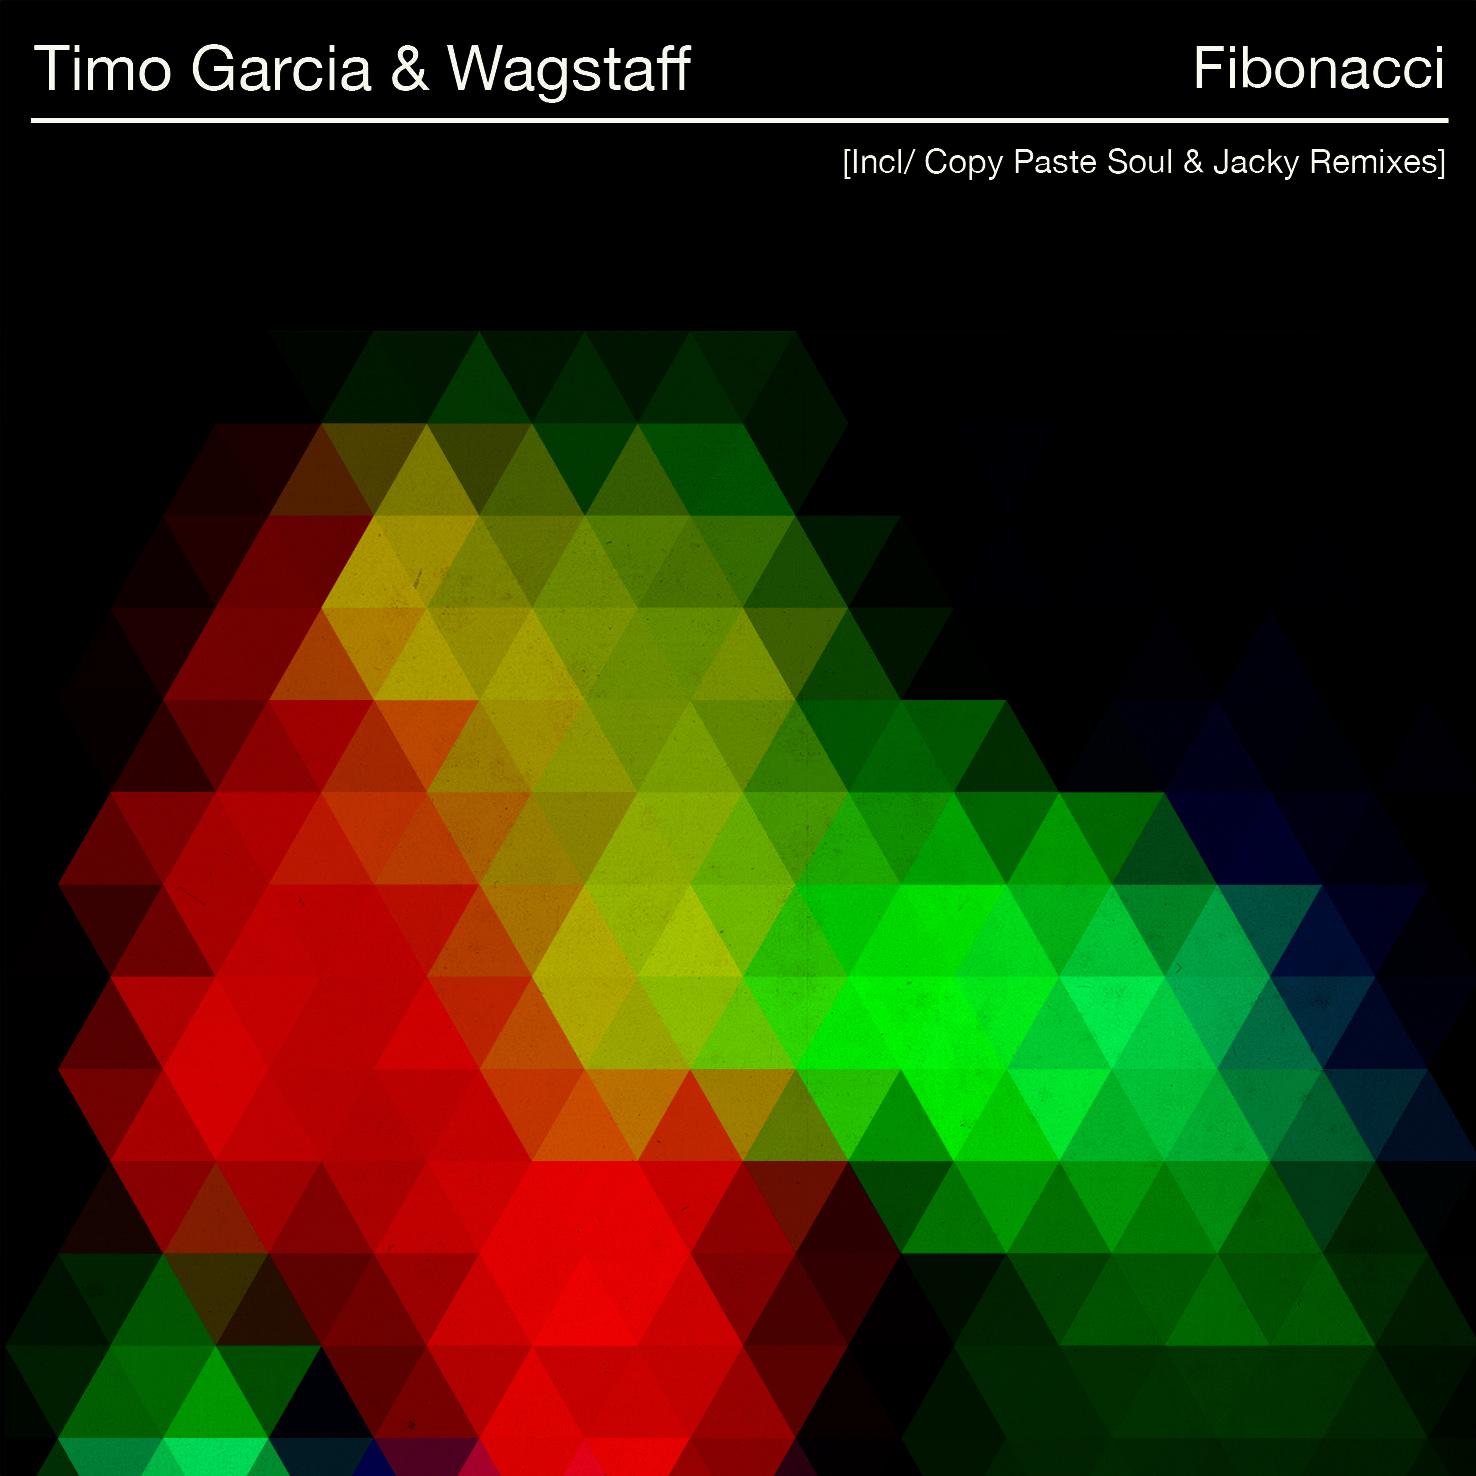 pack_shot_timo_garcia_wagstaff_-_fibonacci_ep.jpg